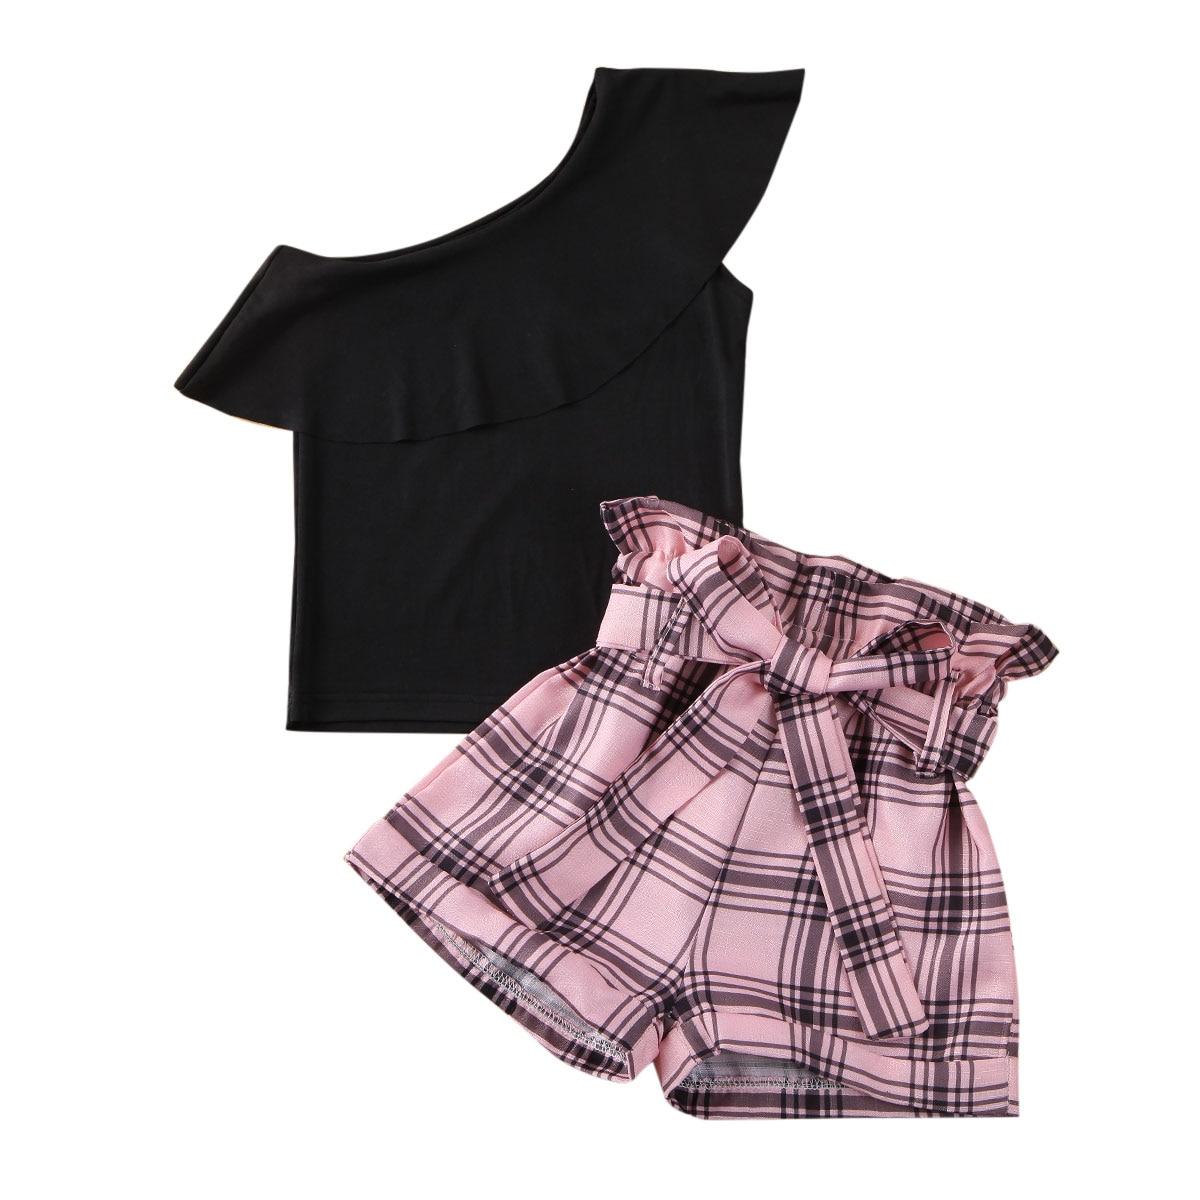 Pudcoco Toddler Baby Girl Clothes Solid Color Off Shoulder Ruffle Tops Plaids Short Pants 2Pcs Outfits Cotton Clothes Set